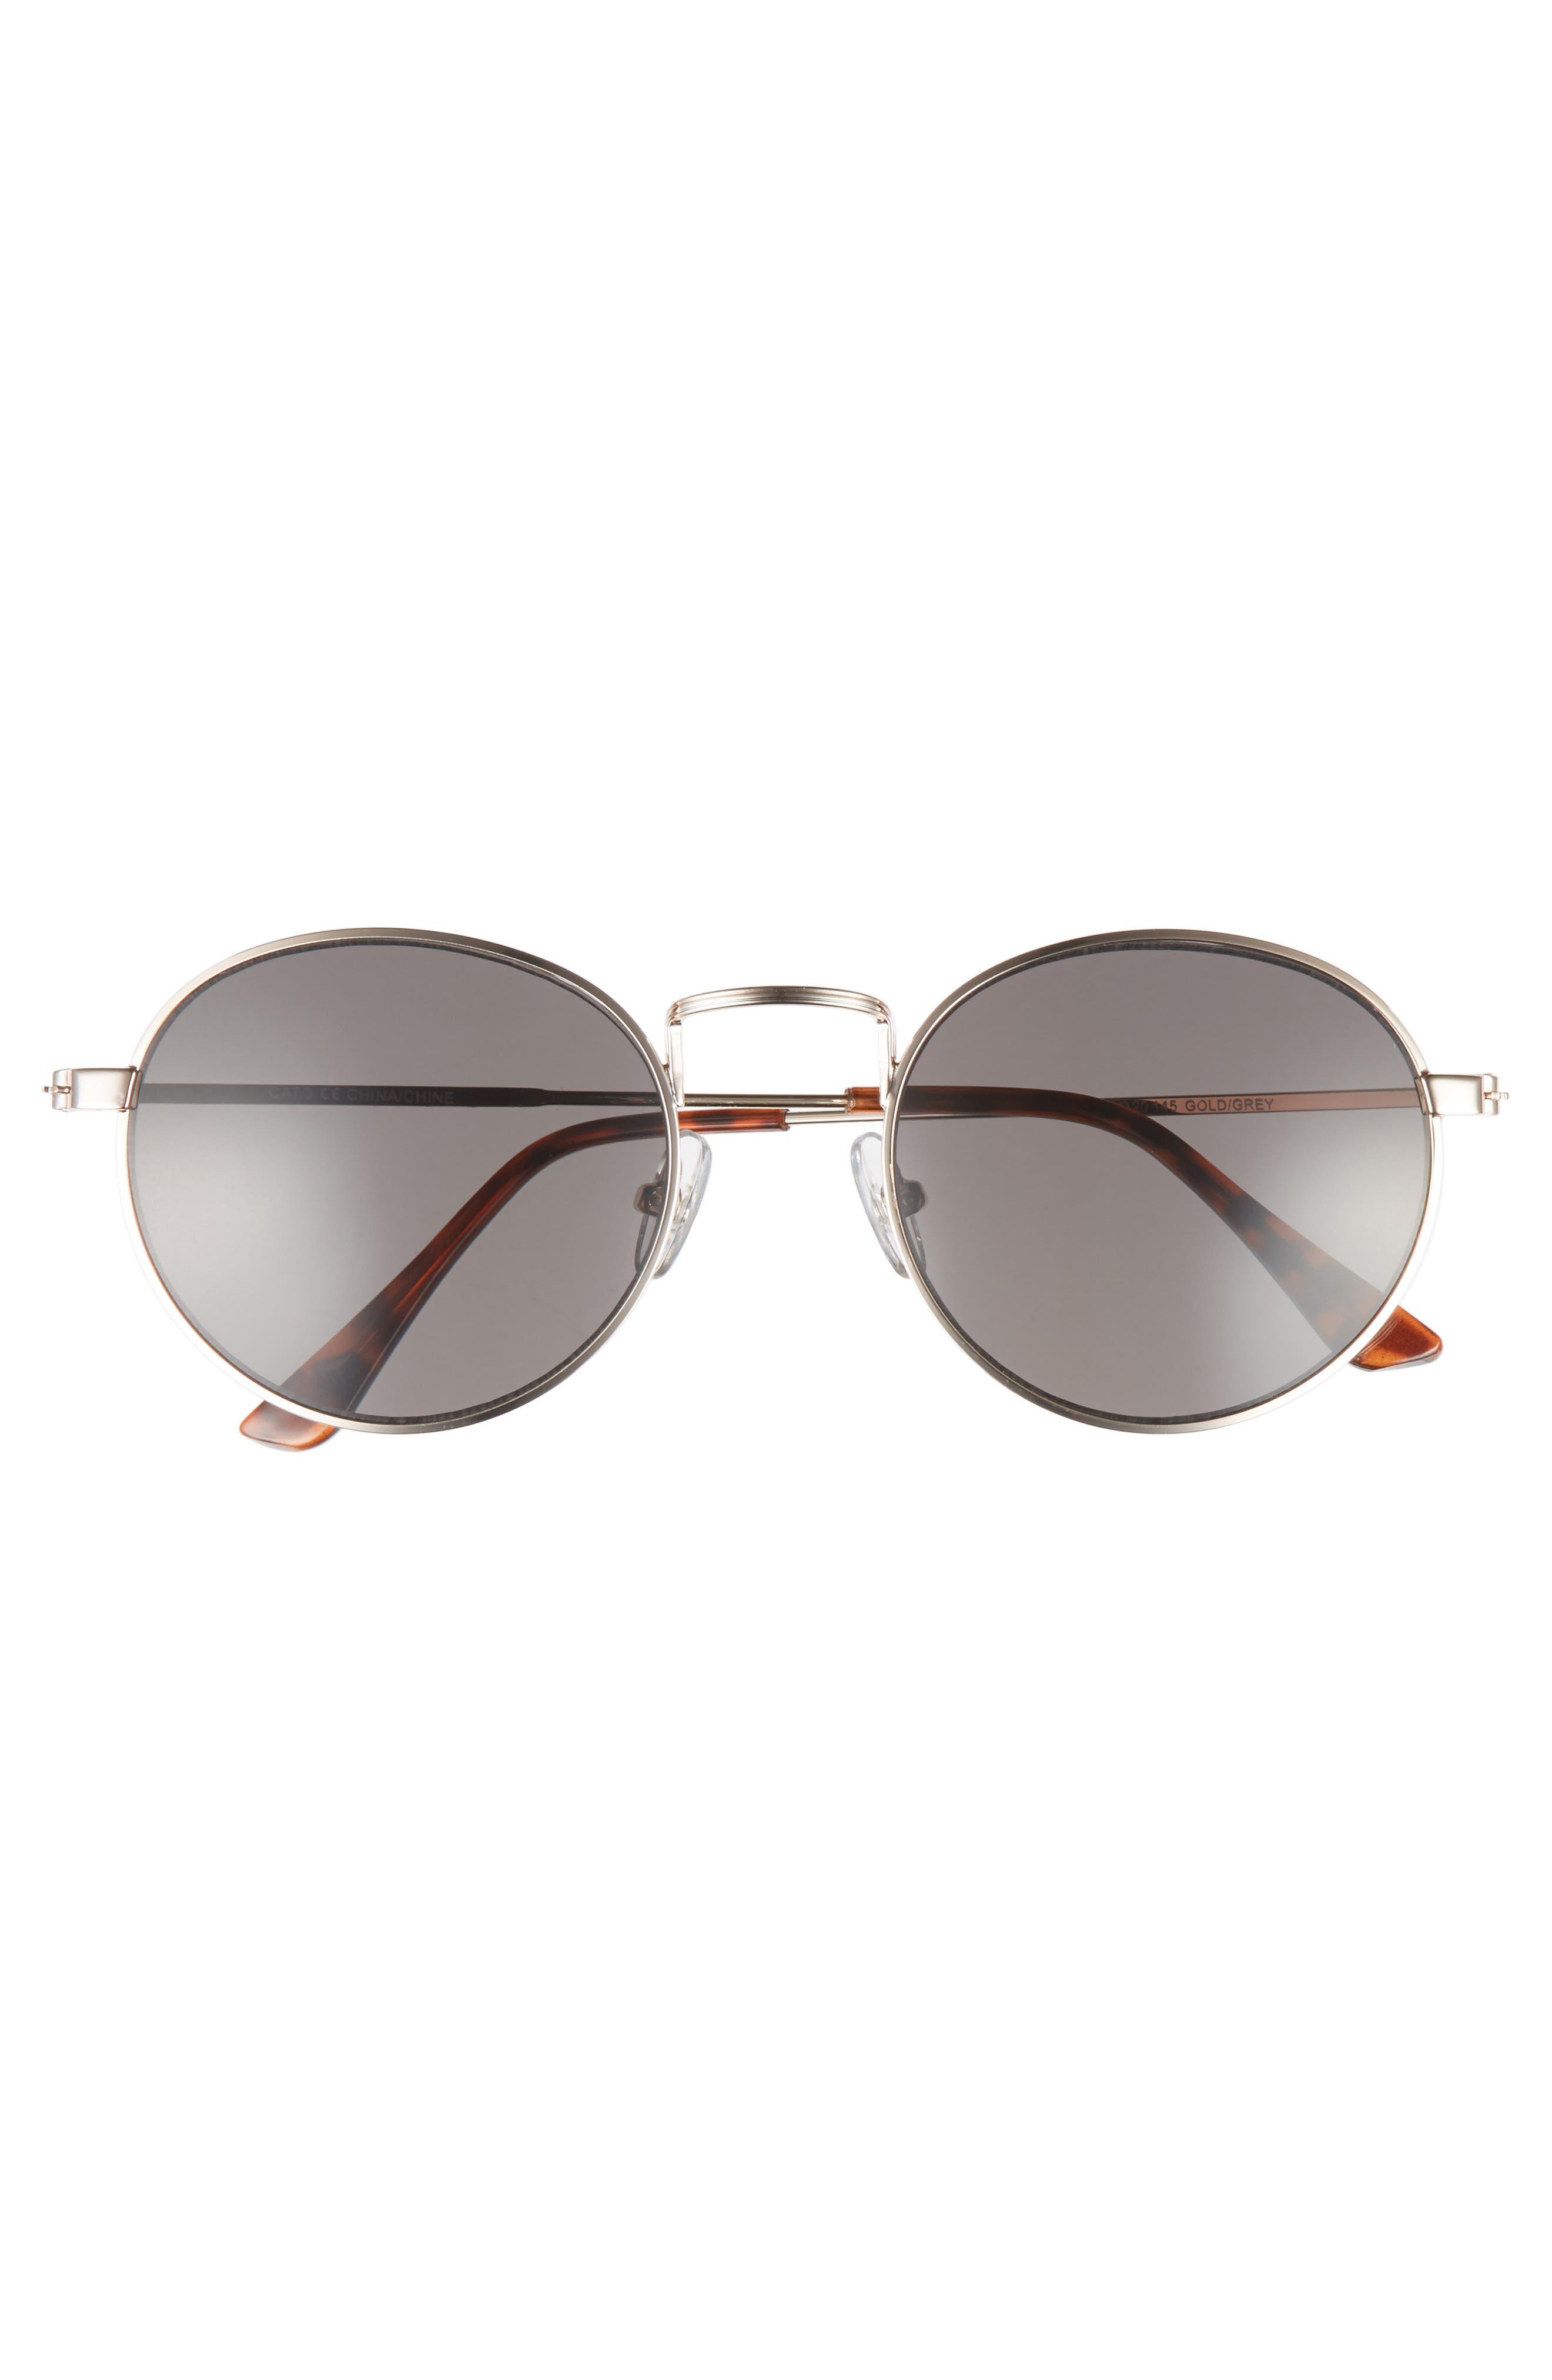 Alternate Image 2  - 1901 Lewis 54mm Round Sunglasses